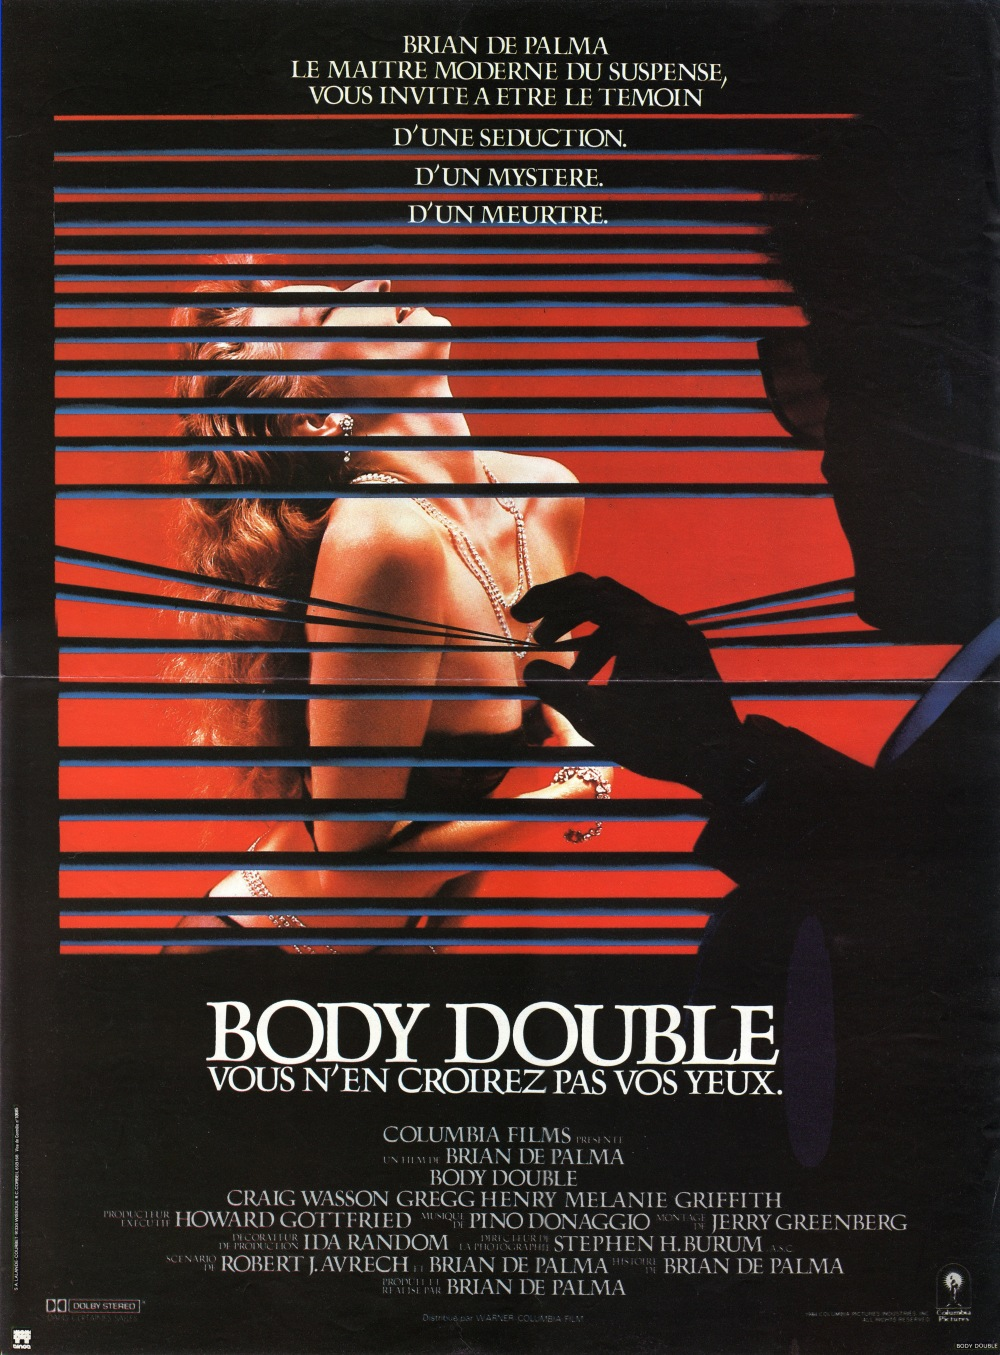 bodydouble-france-1